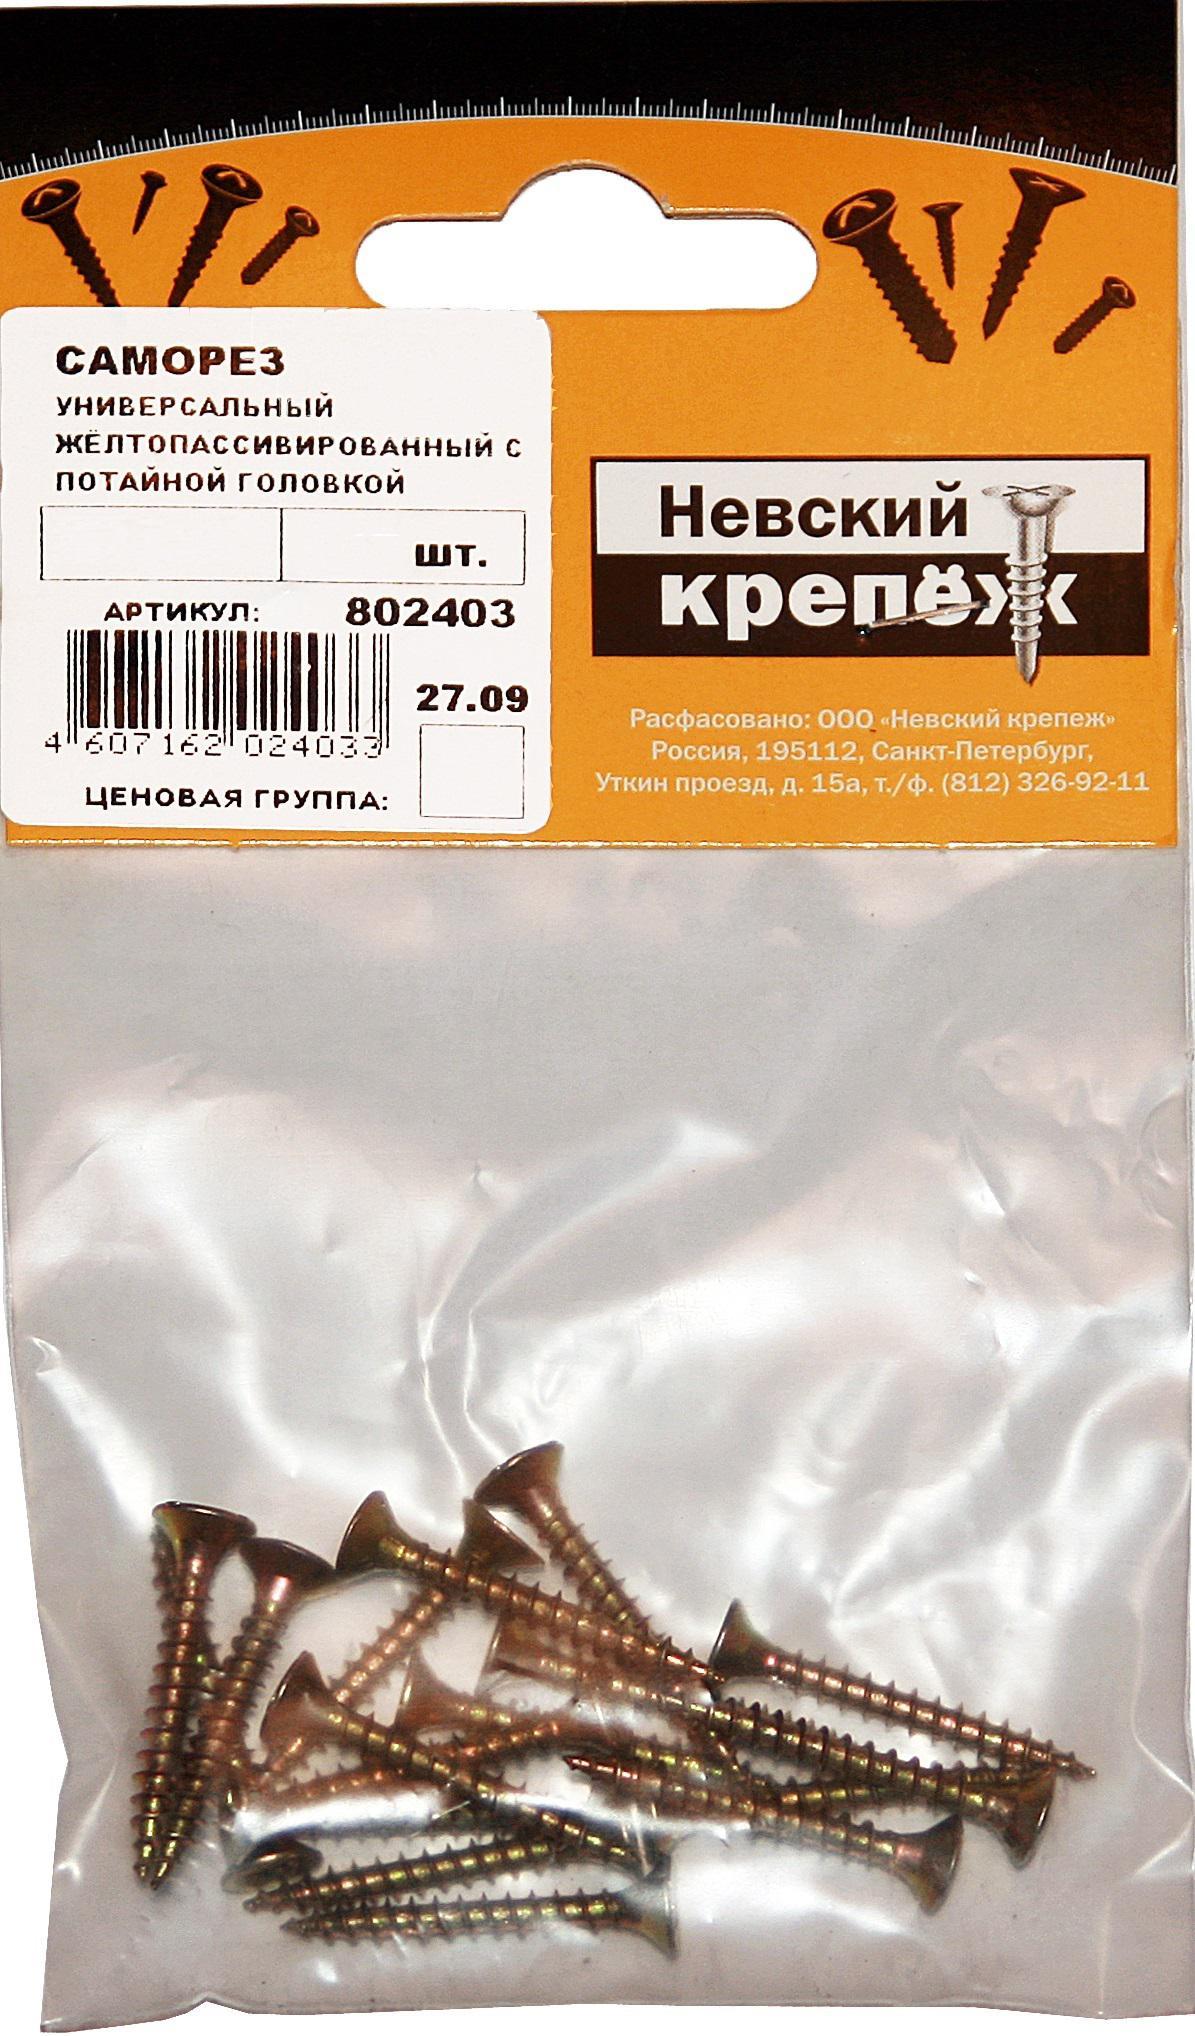 Саморез НЕВСКИЙ КРЕПЕЖ 802408